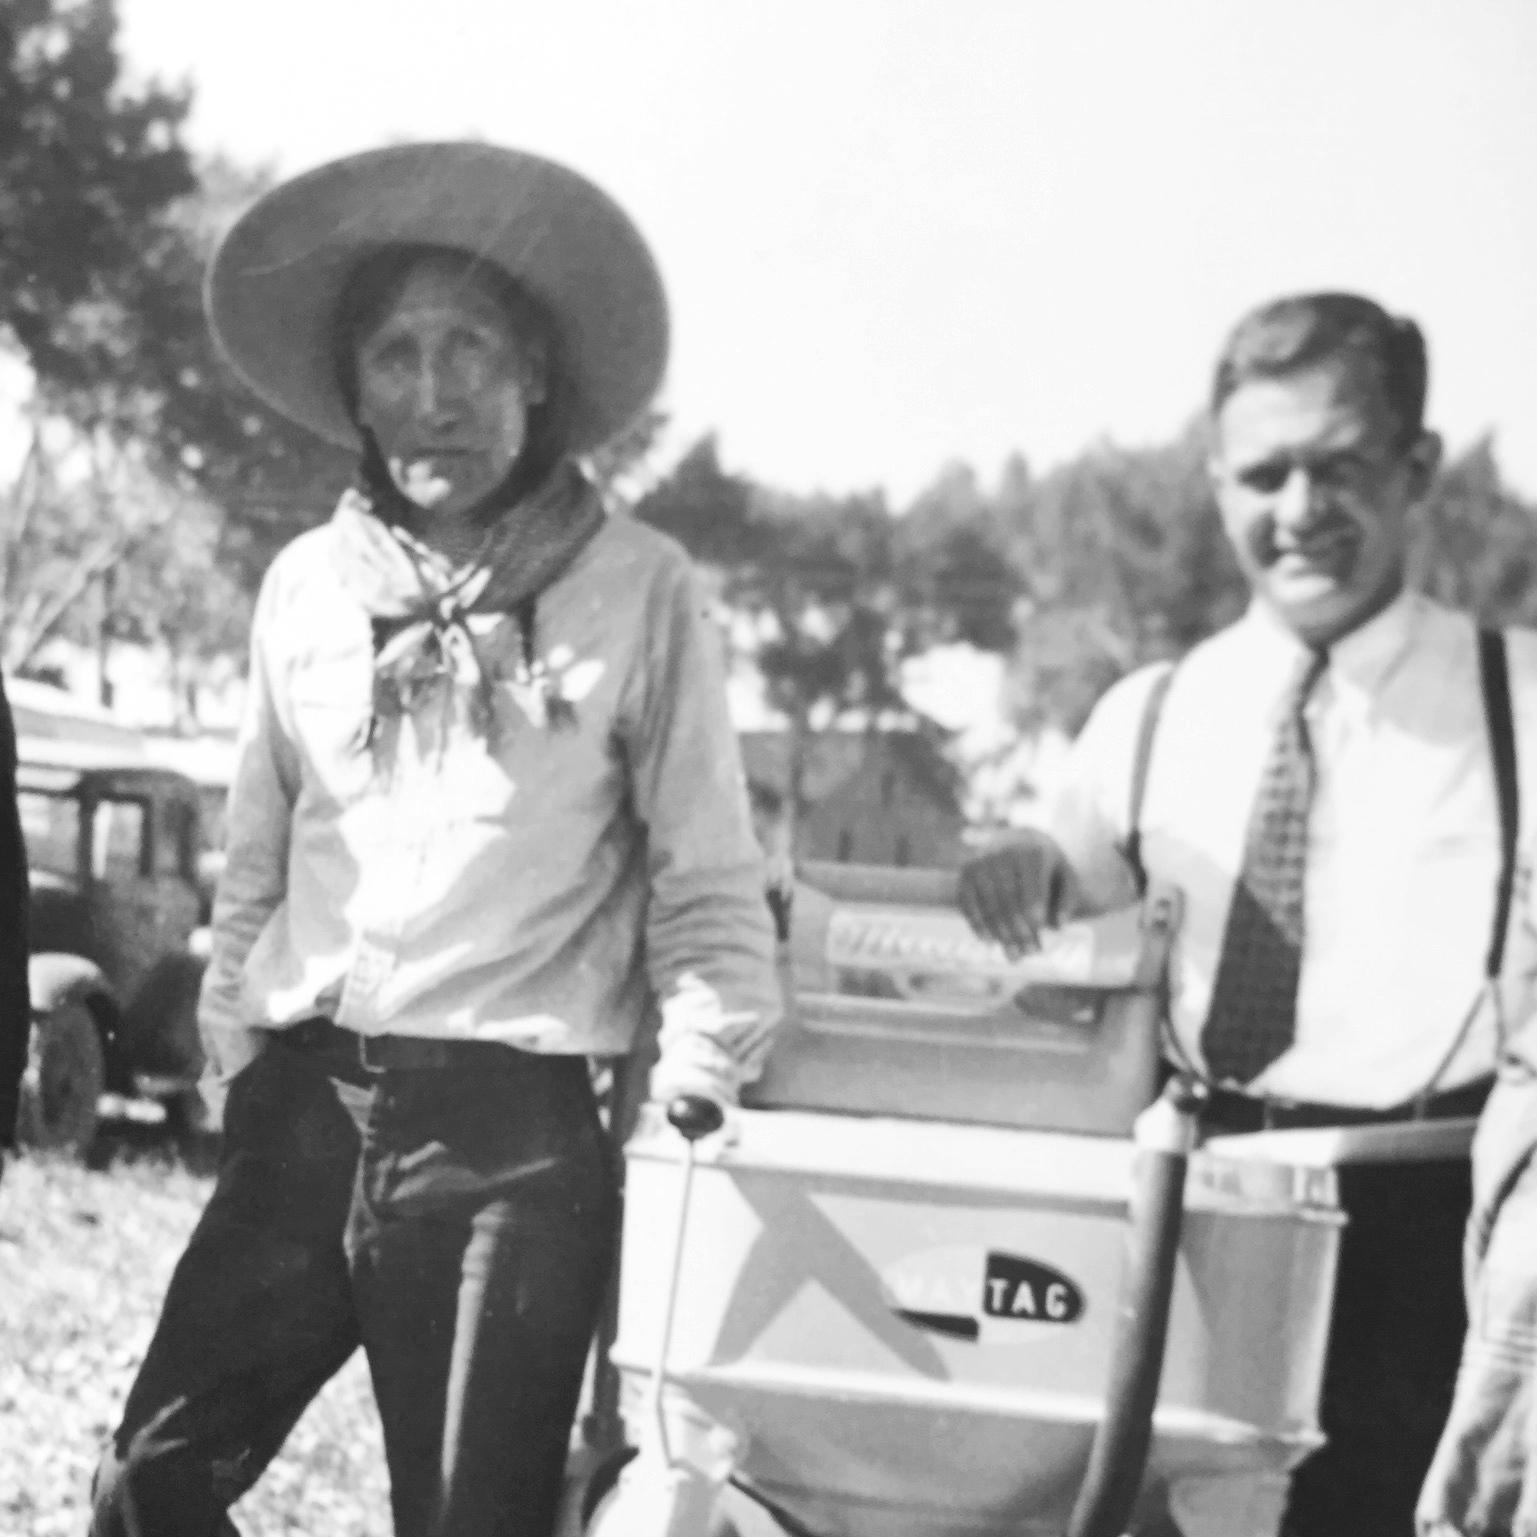 Hainsworth Historic Photo